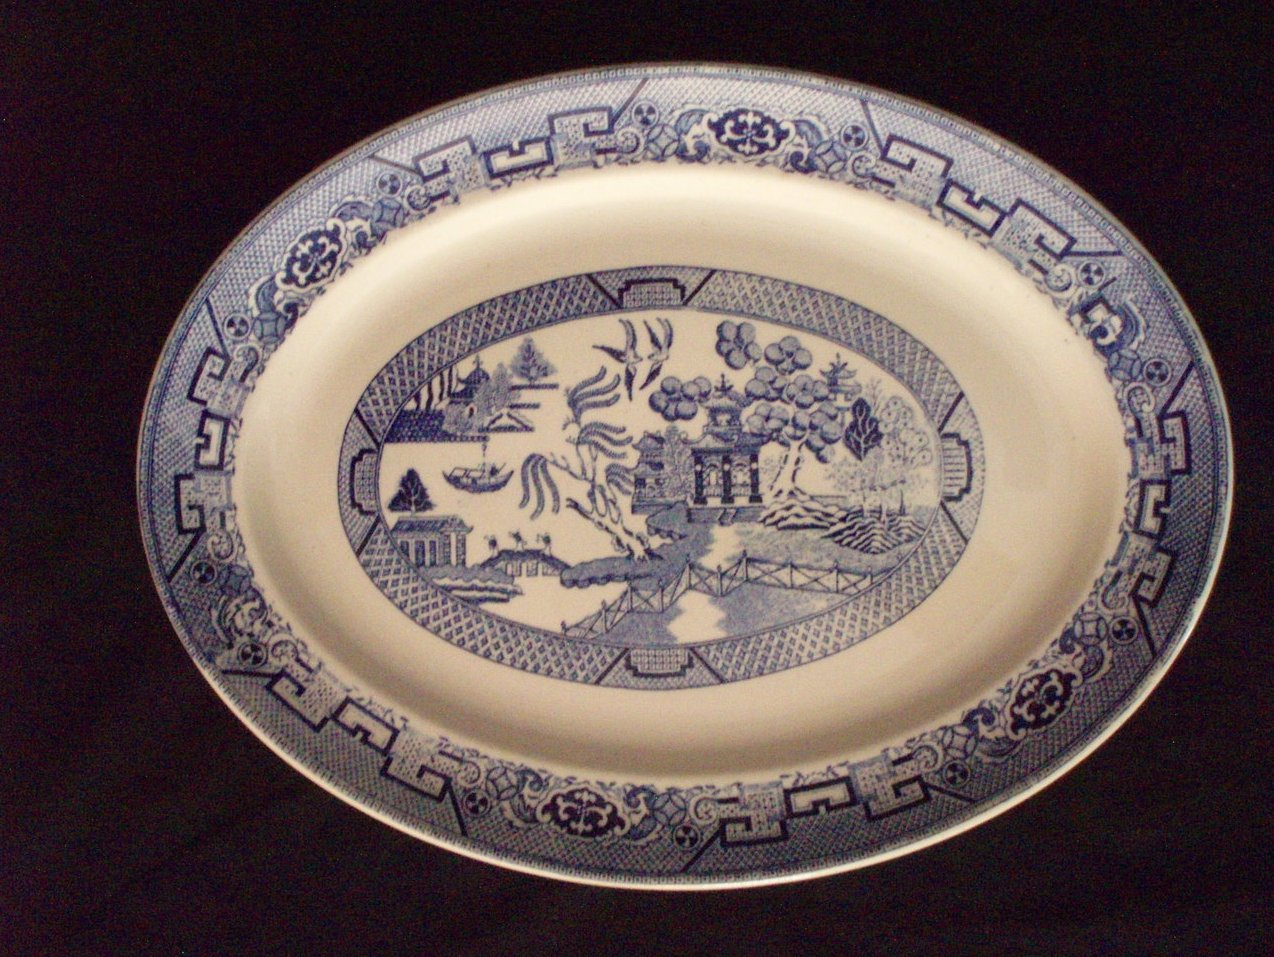 Vintage Homer Laughlin Blue Willow Platter 15.75 x 11.5